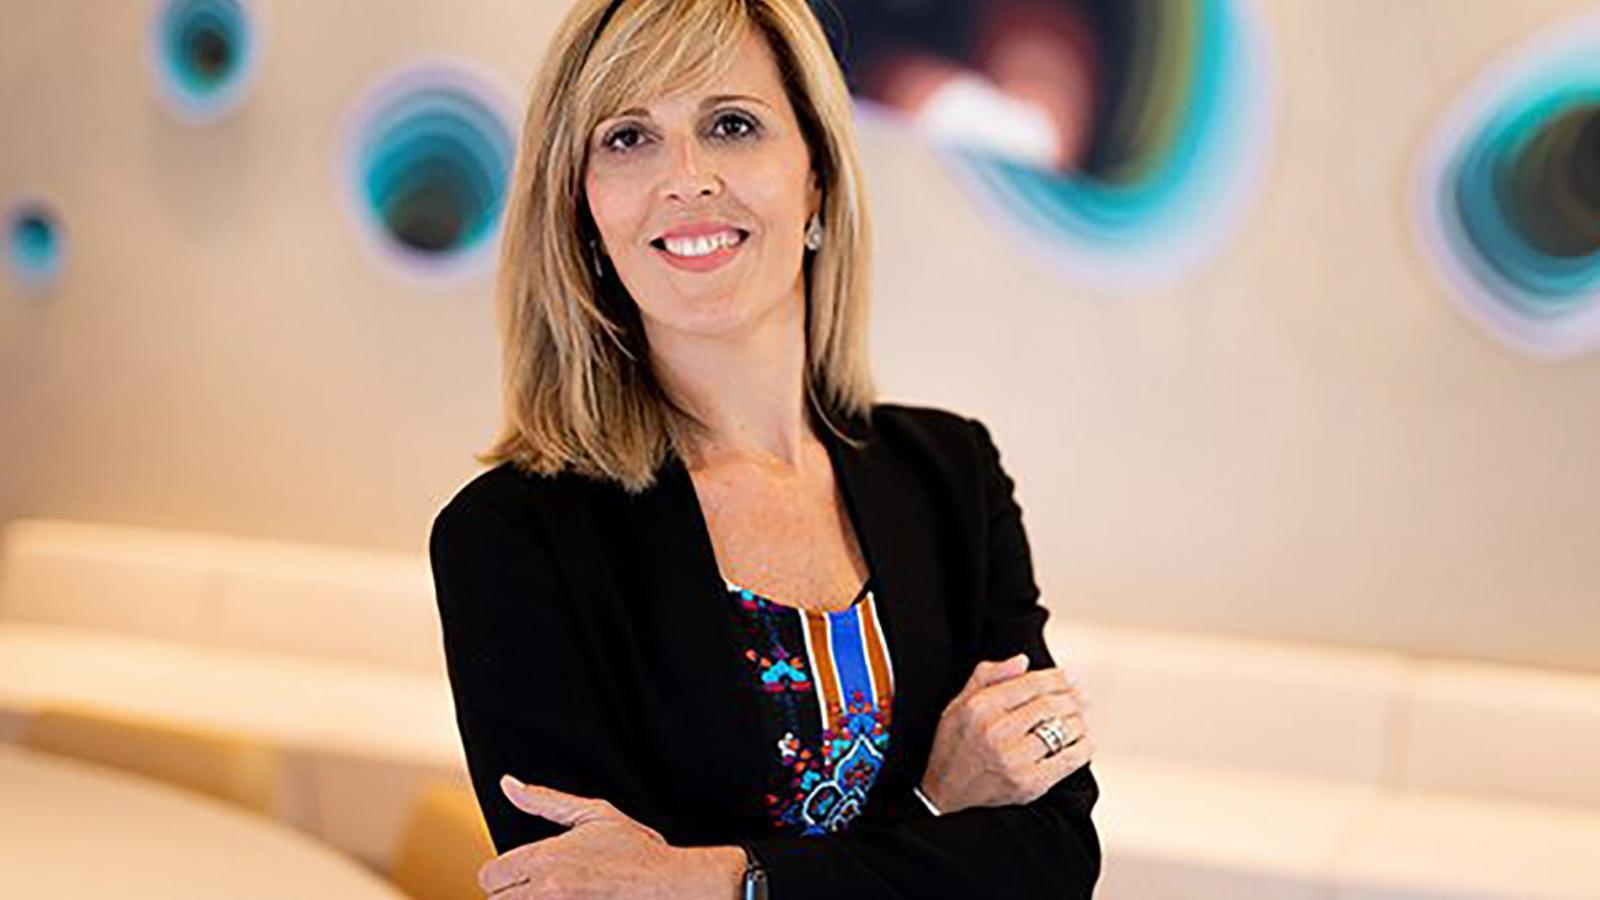 La nova directiva d'Andbank, Anna Olsina. / ANDBANK